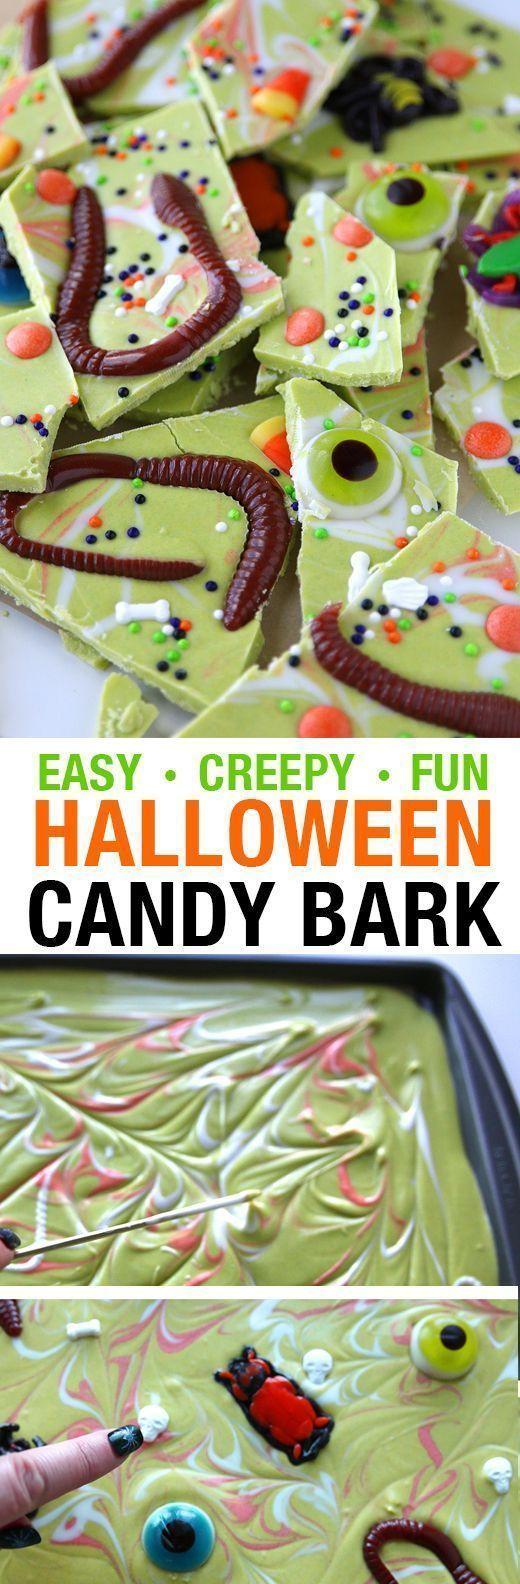 best lekker voor kids images on pinterest petit fours candy